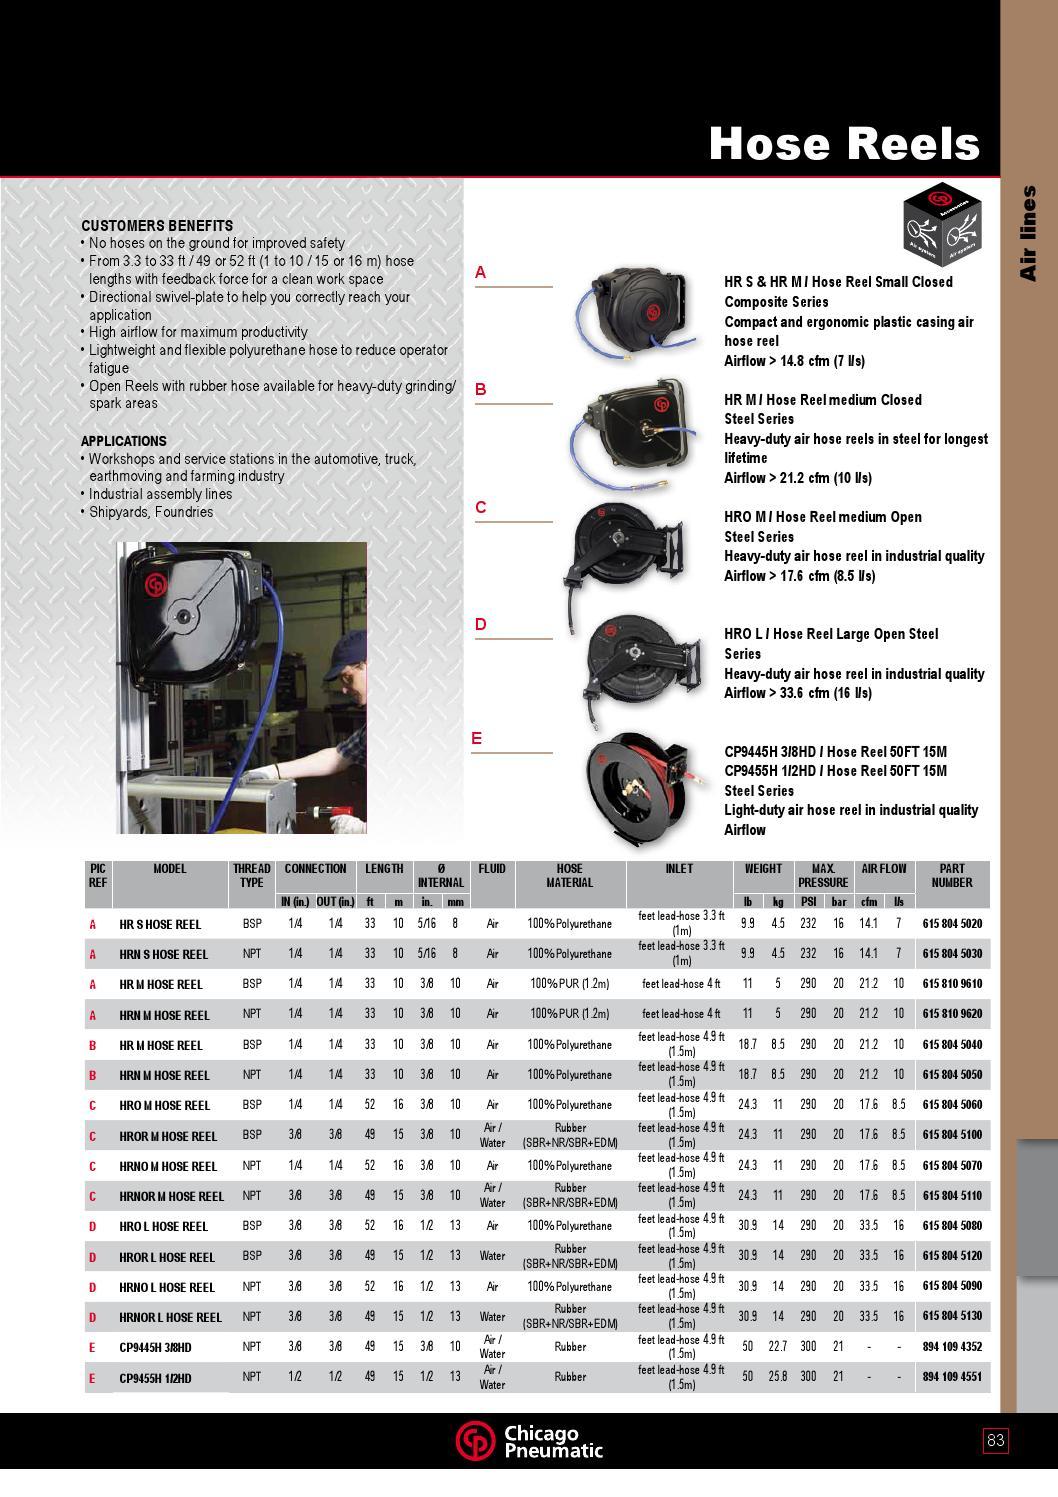 8941094551 CHICAGO PNEUMATIC Hose Reel CP9455H 1//2HD